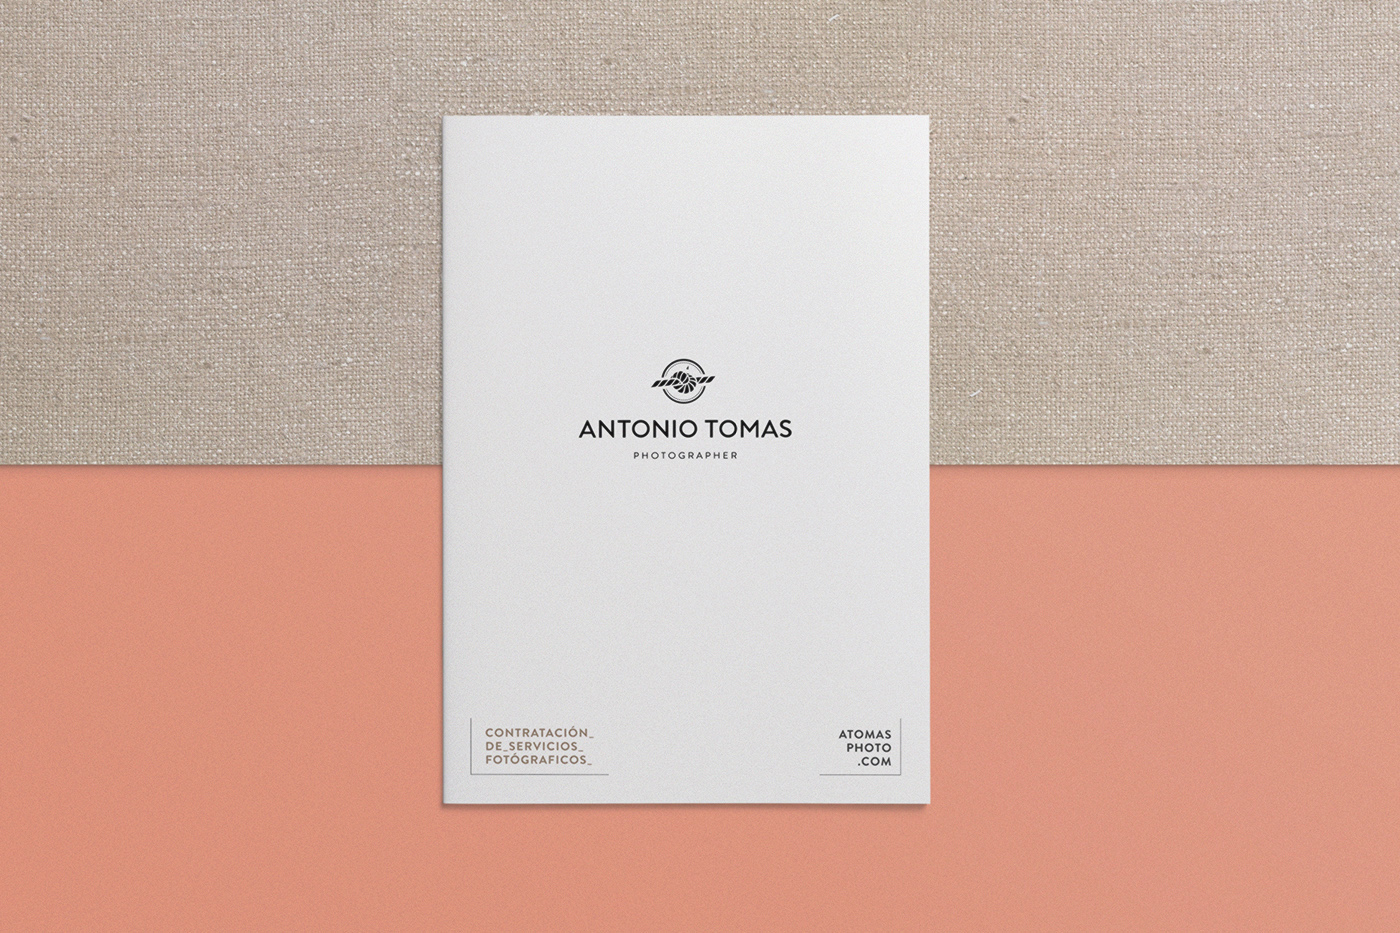 Antonio Tomas contrato 1